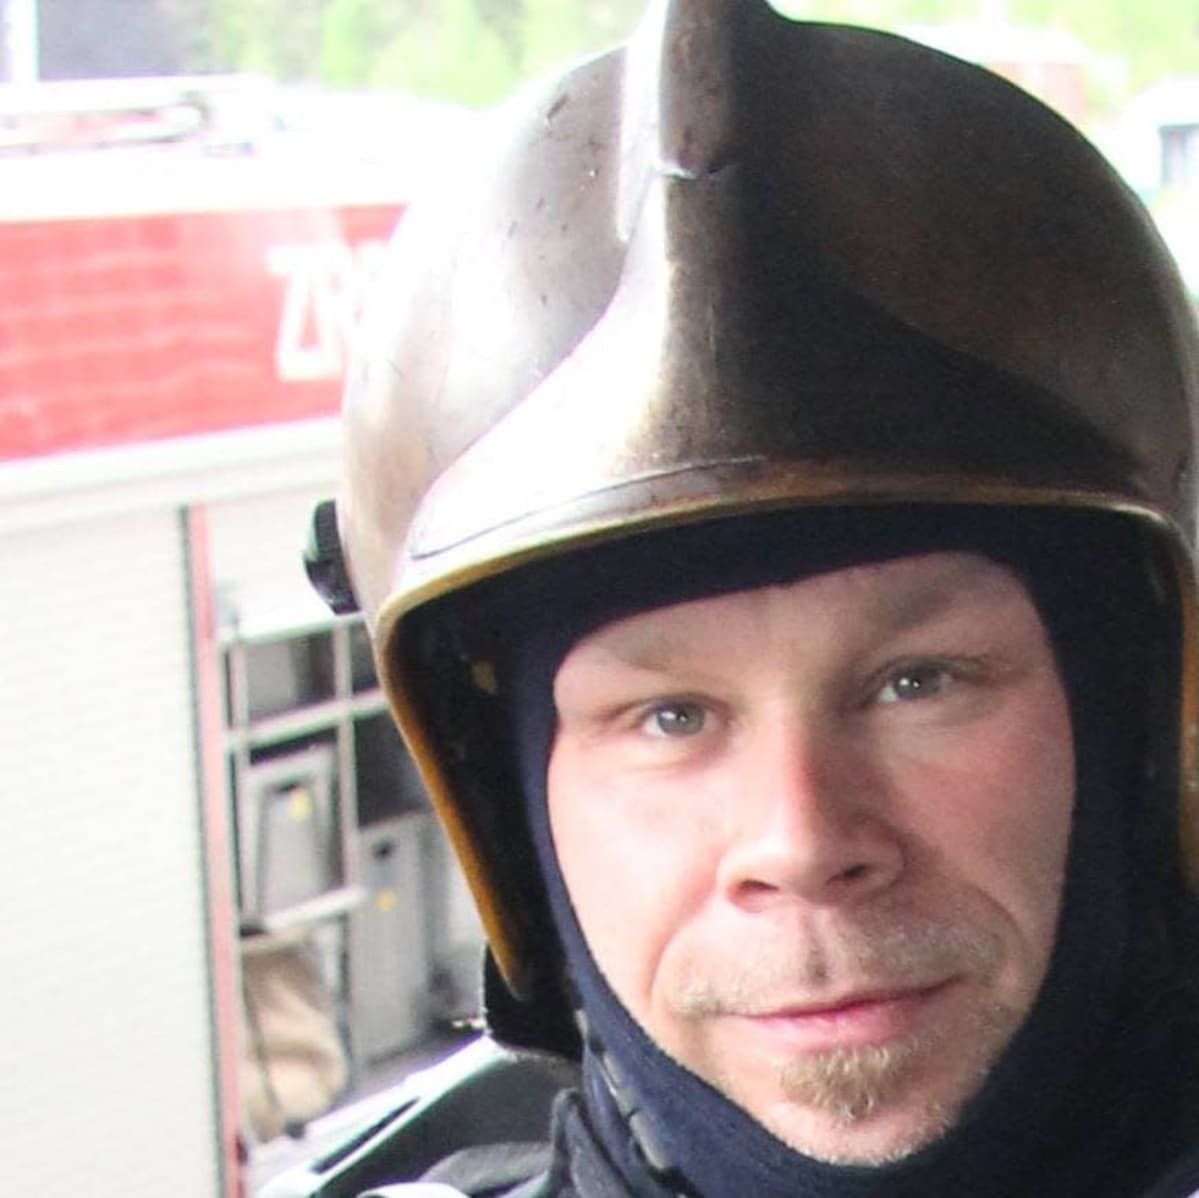 Marko Hassinen